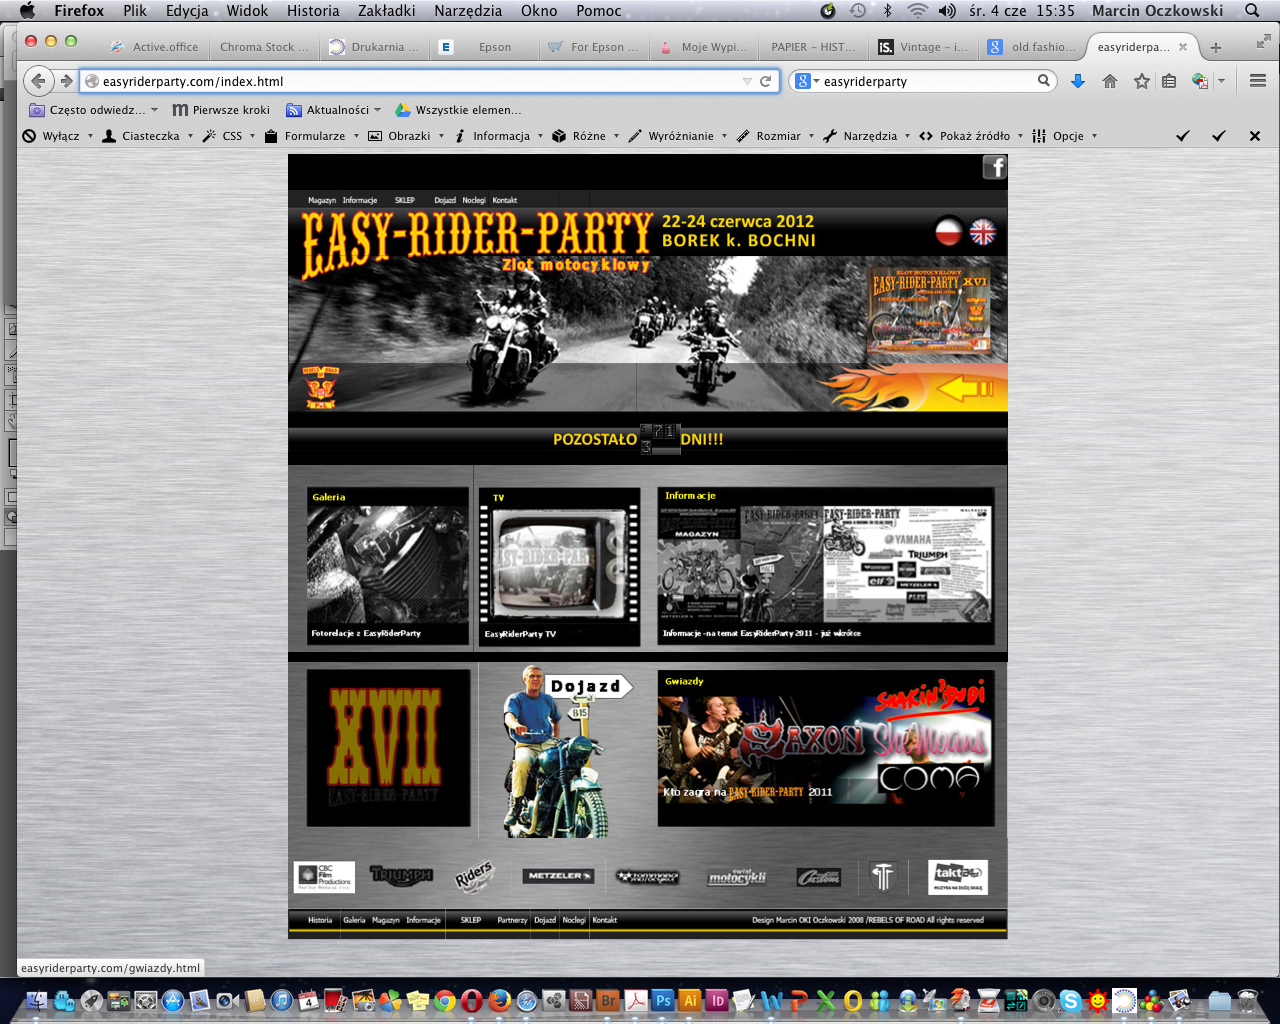 Zrzut ekranu 2014-06-4 o 15.35.56